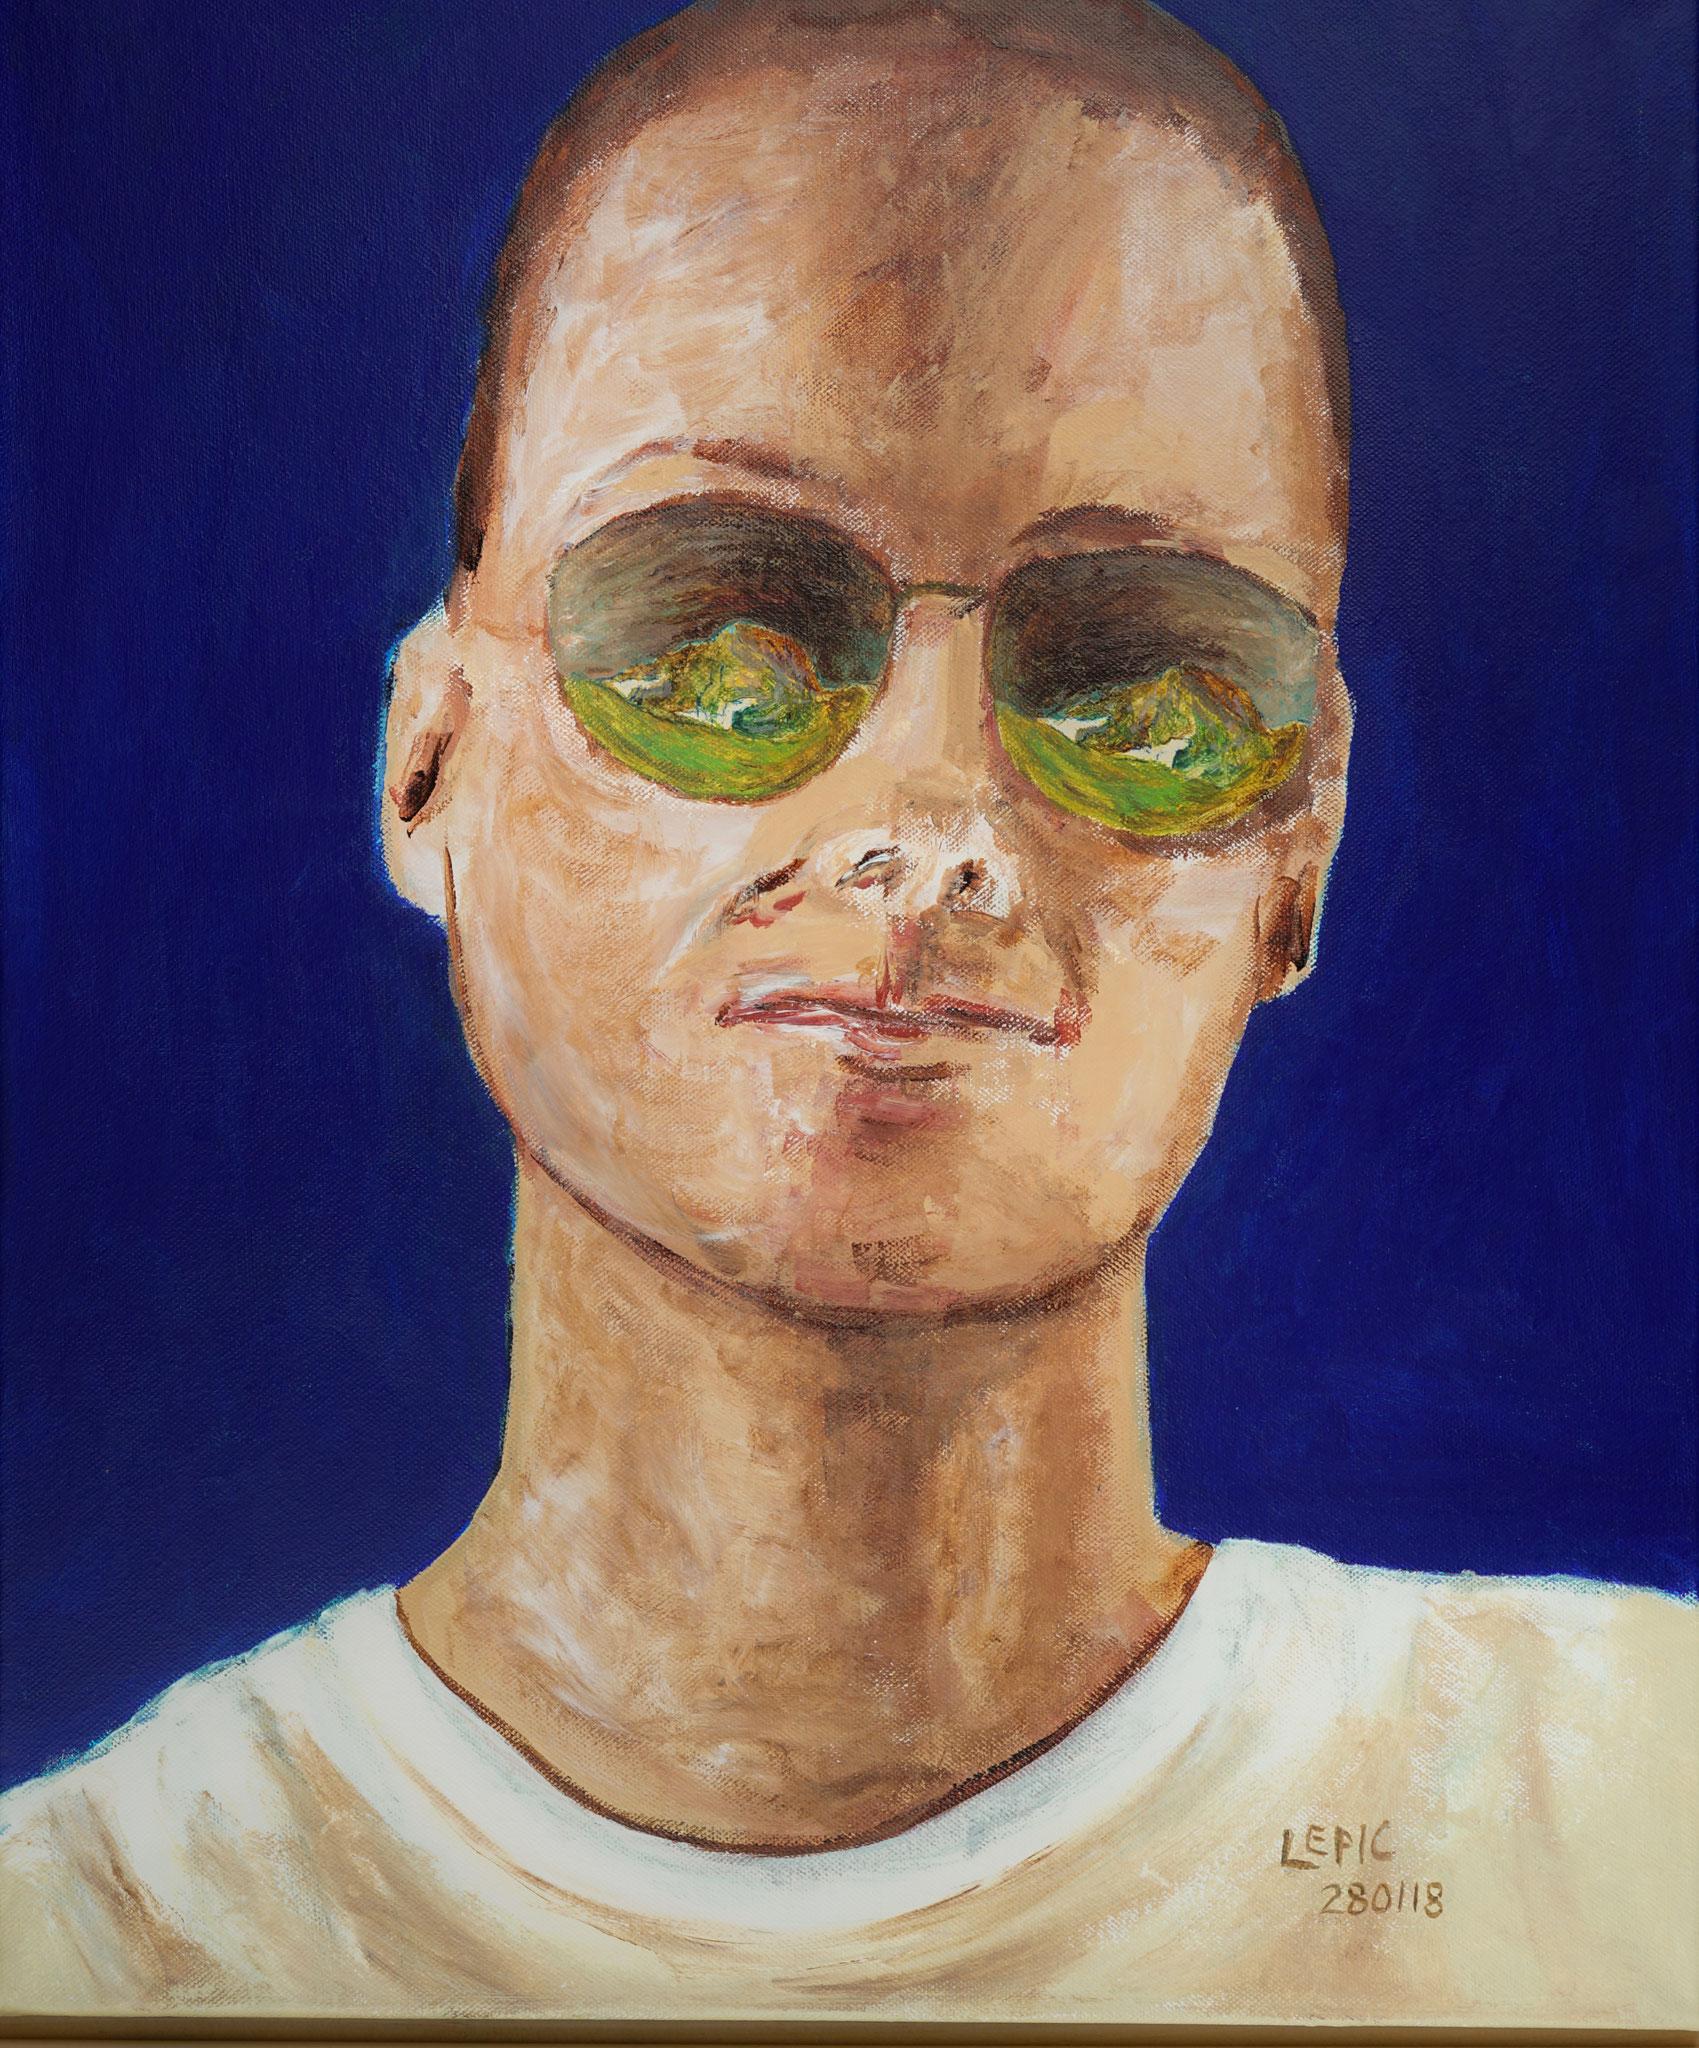 FÖHNJUNGE IN OHLSTADT Acryl auf Leinwand - 60 x 50 cm